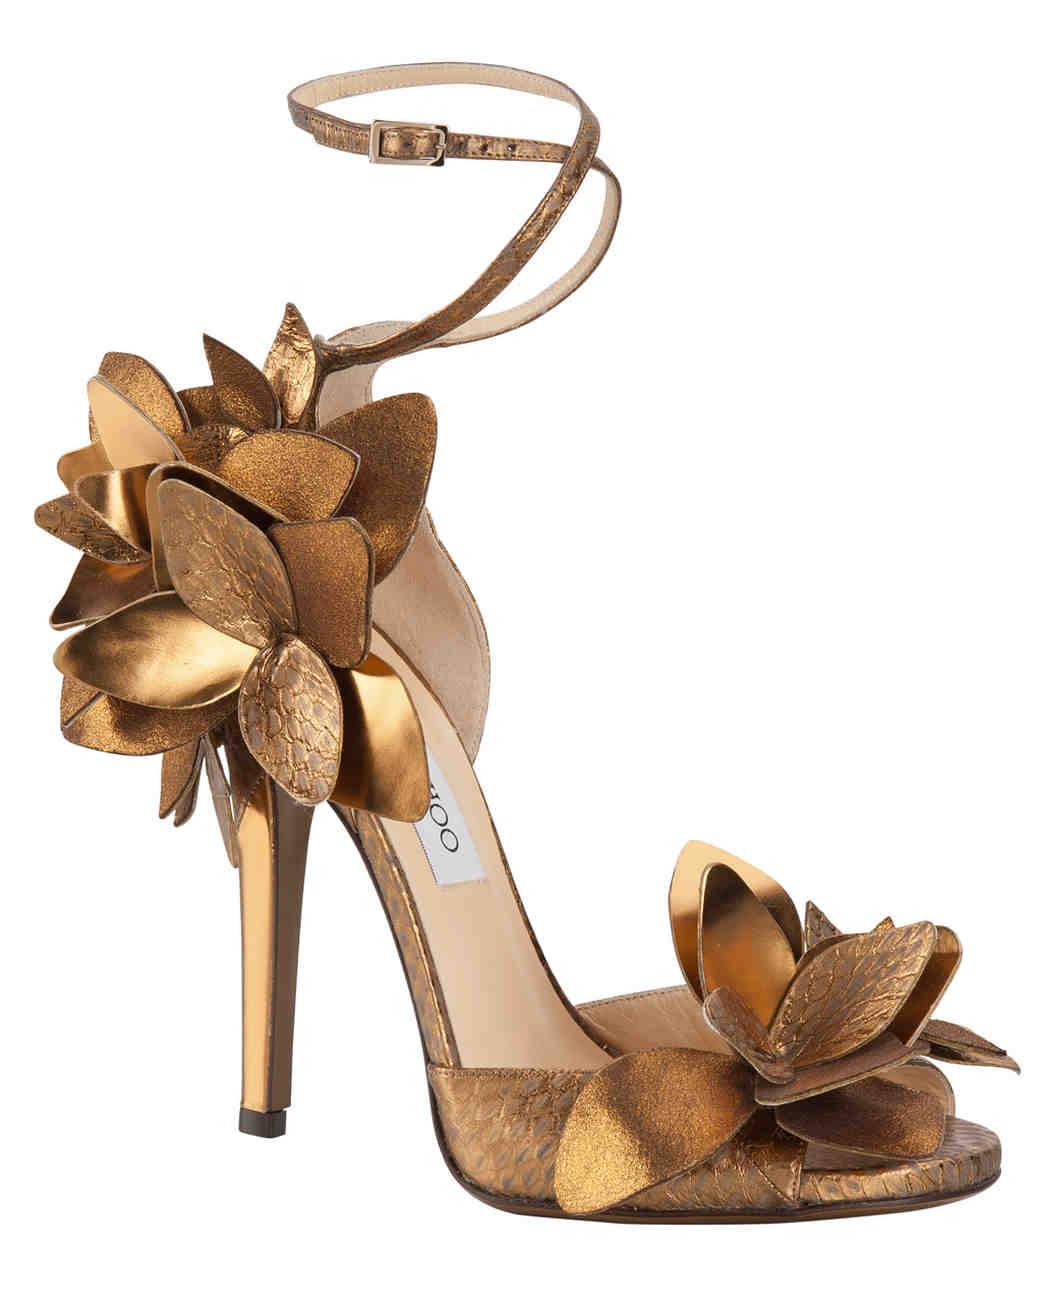 Copper Shoes Wedding 006 - Copper Shoes Wedding